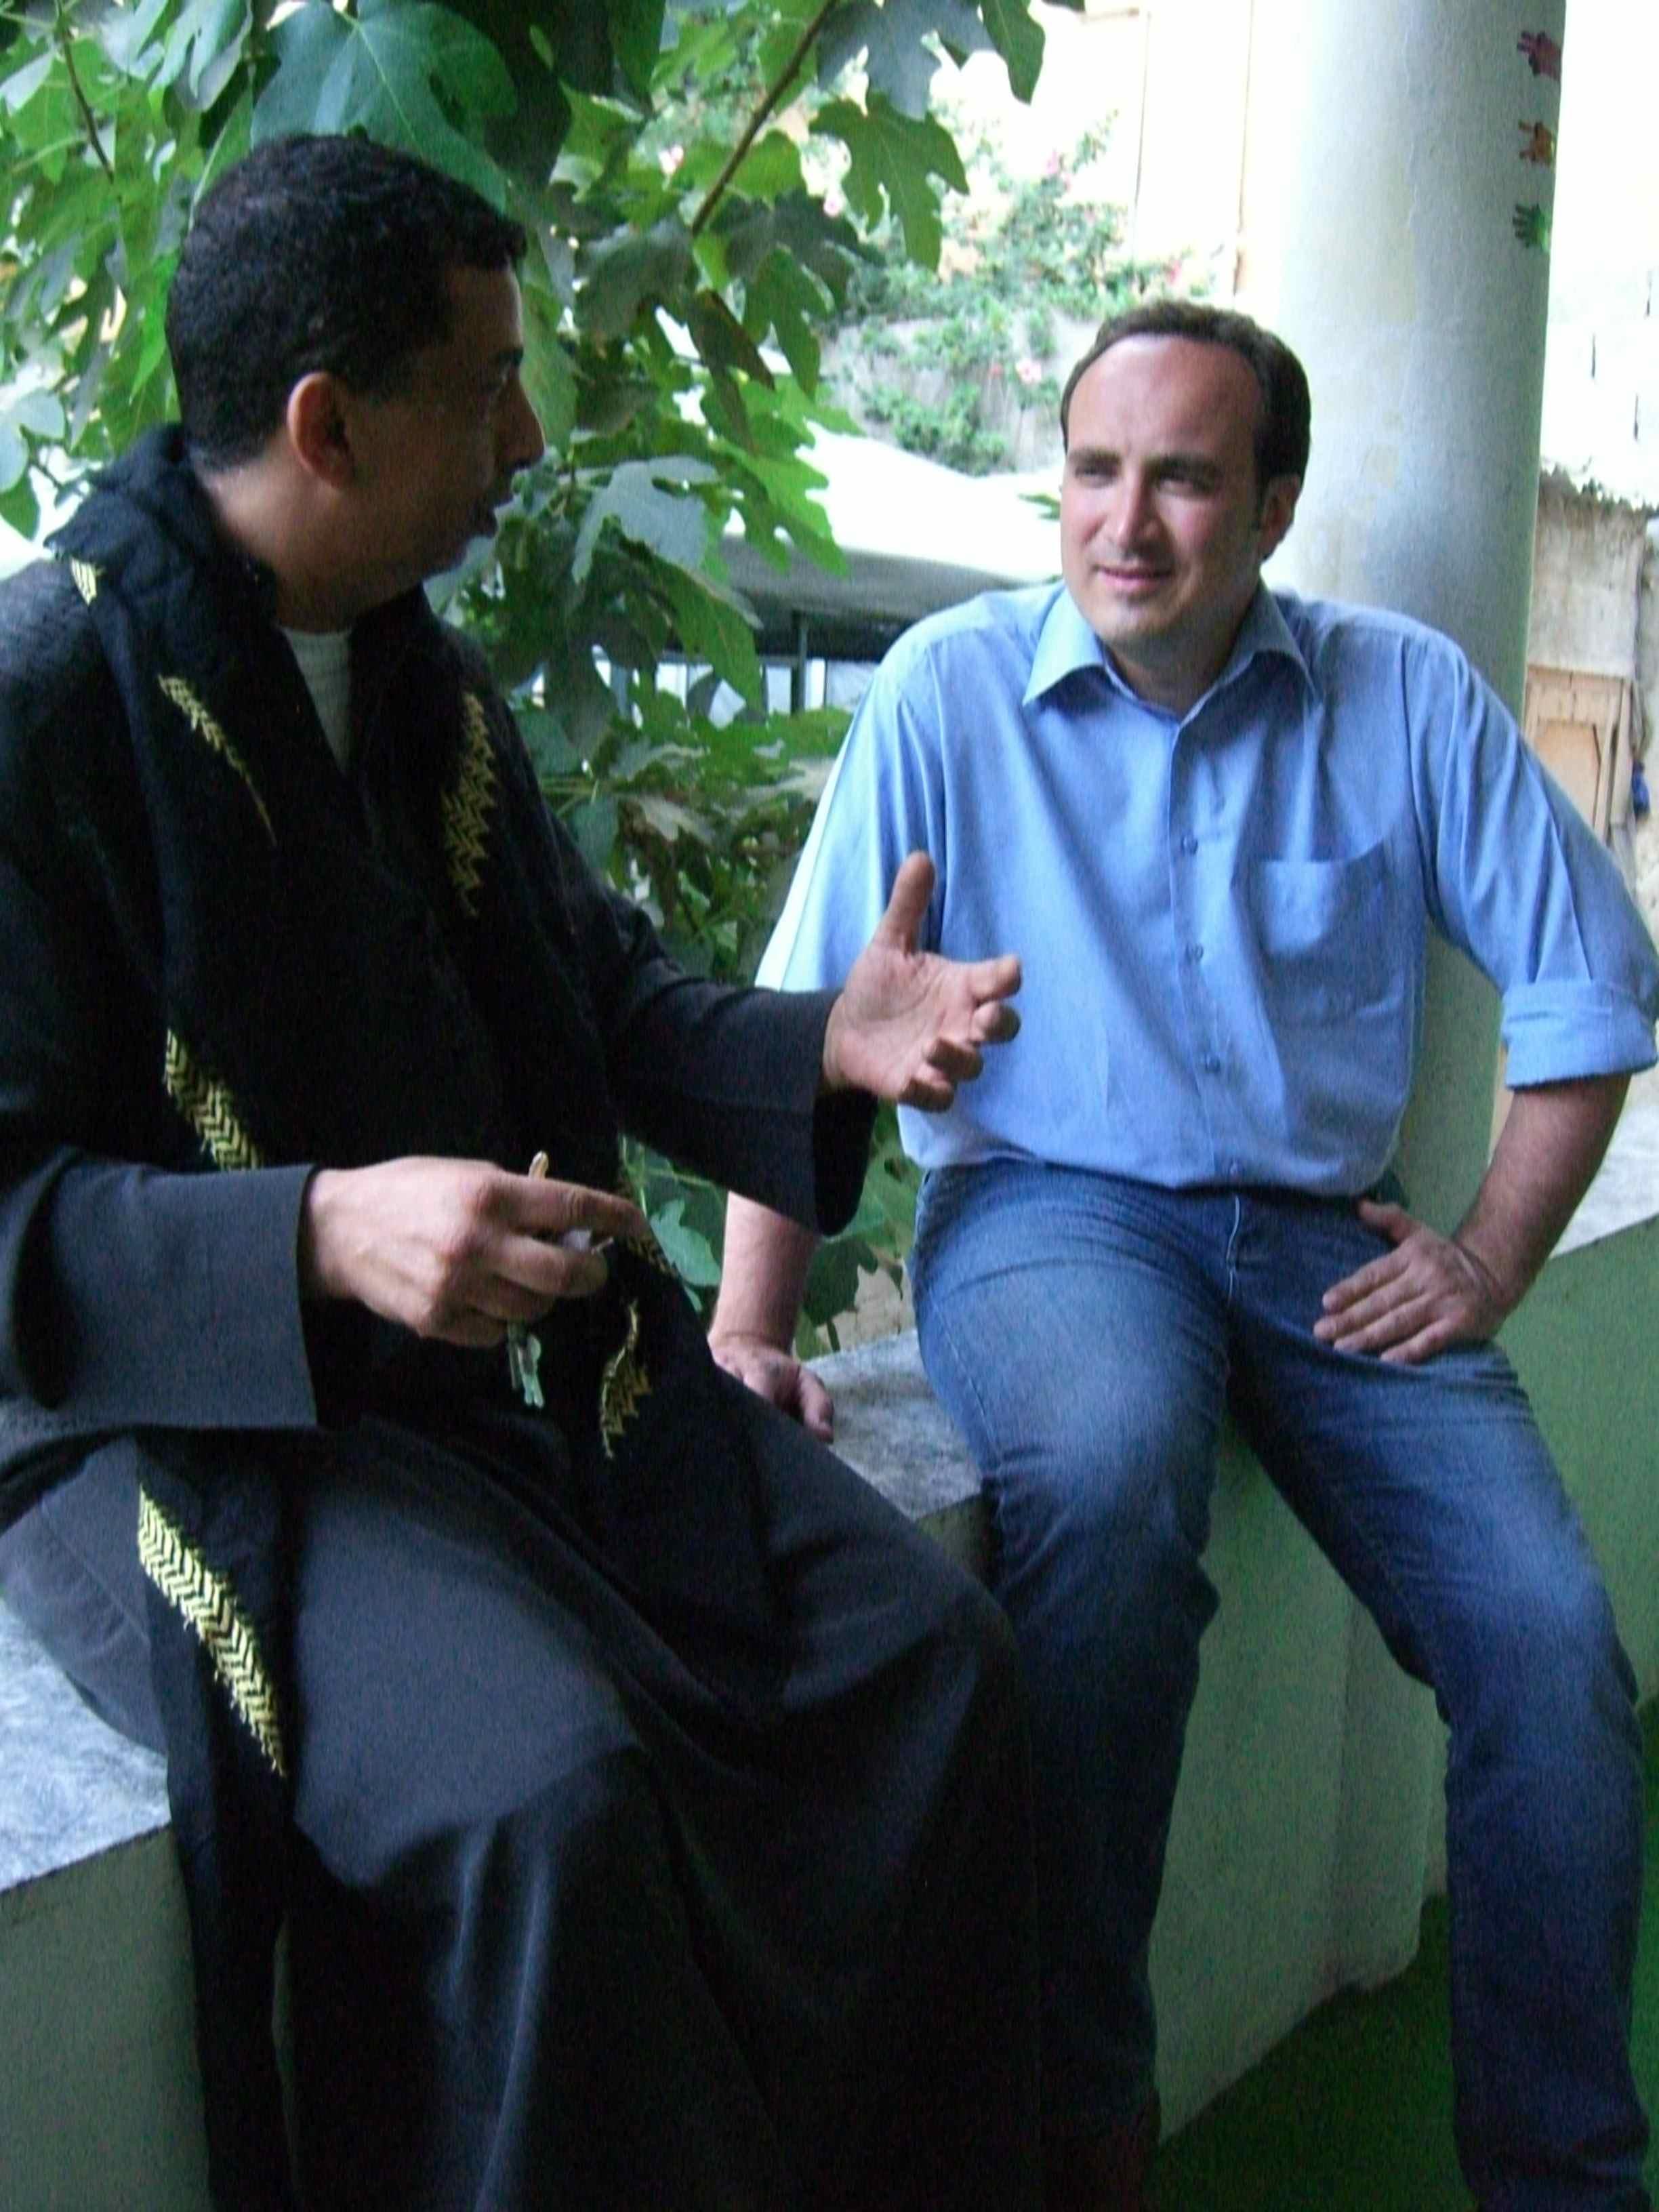 Photo CNN/Dane Kenny. Mohammed Jamjoom talking to rapper AJ, the self-styled Godfather of Yemeni Hip Hop.